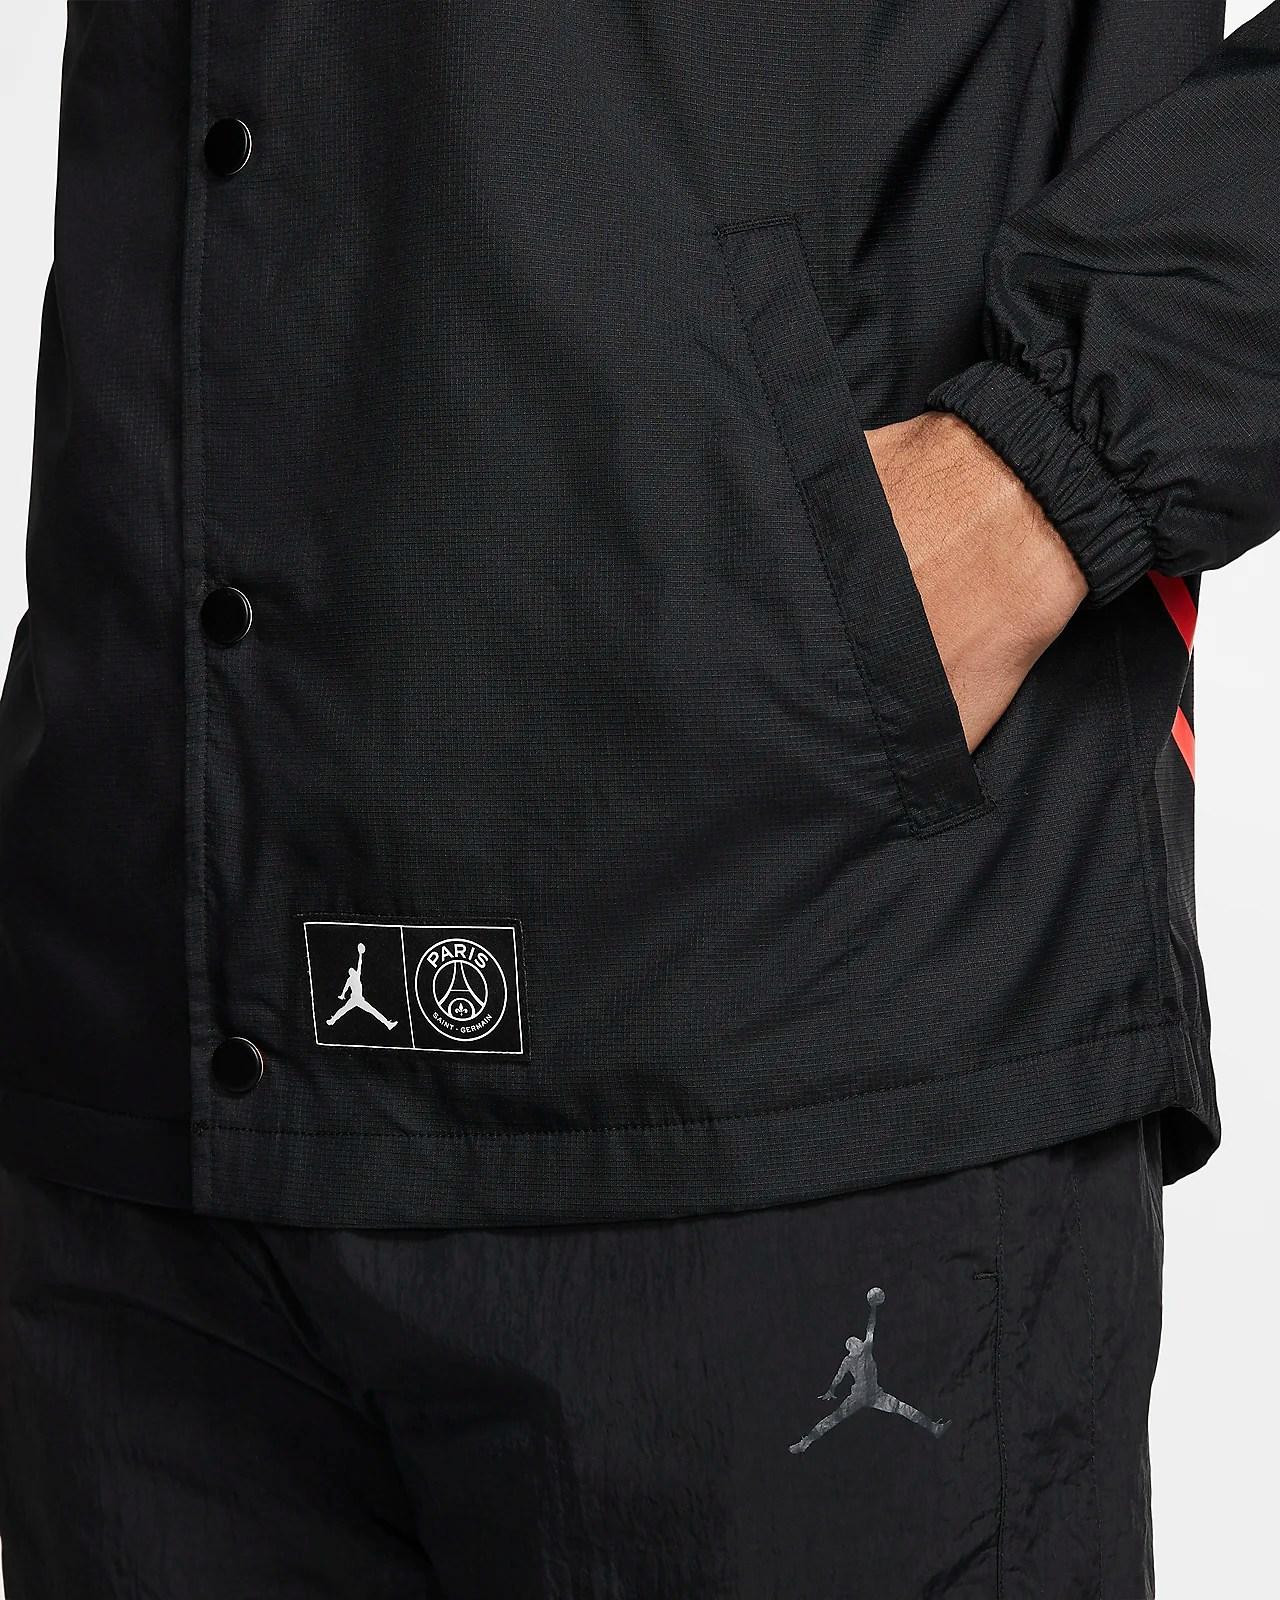 موسيقى الترانزستور المسنين nike jordan x psg coaches jacket